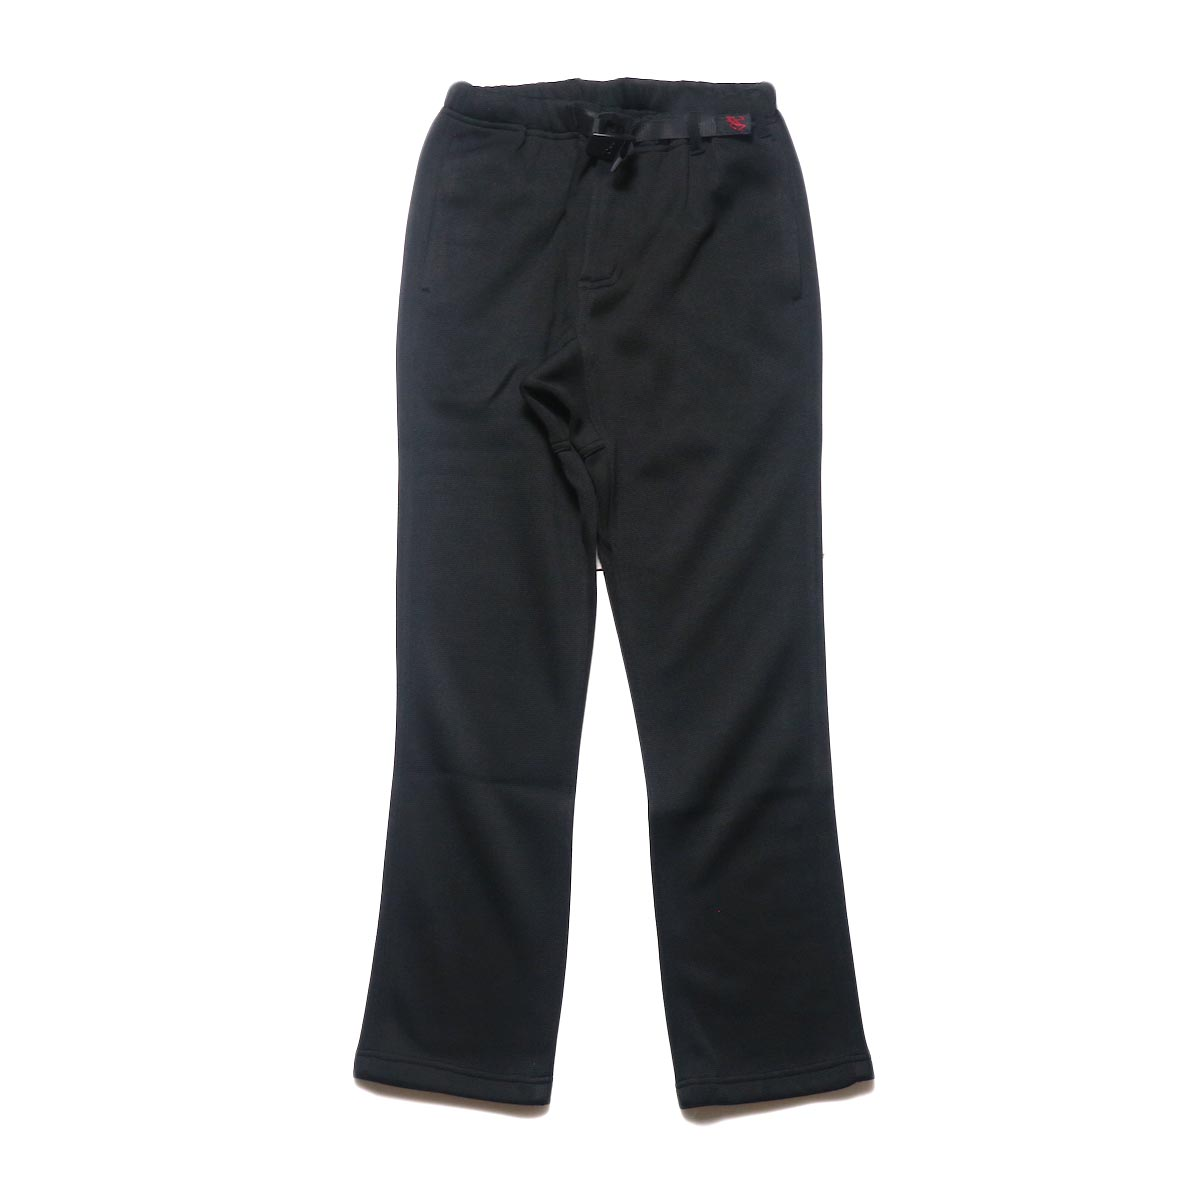 GRAMICCI / BONDING KNIT FLEECE NN-PANTS JUST CUT (Black)正面